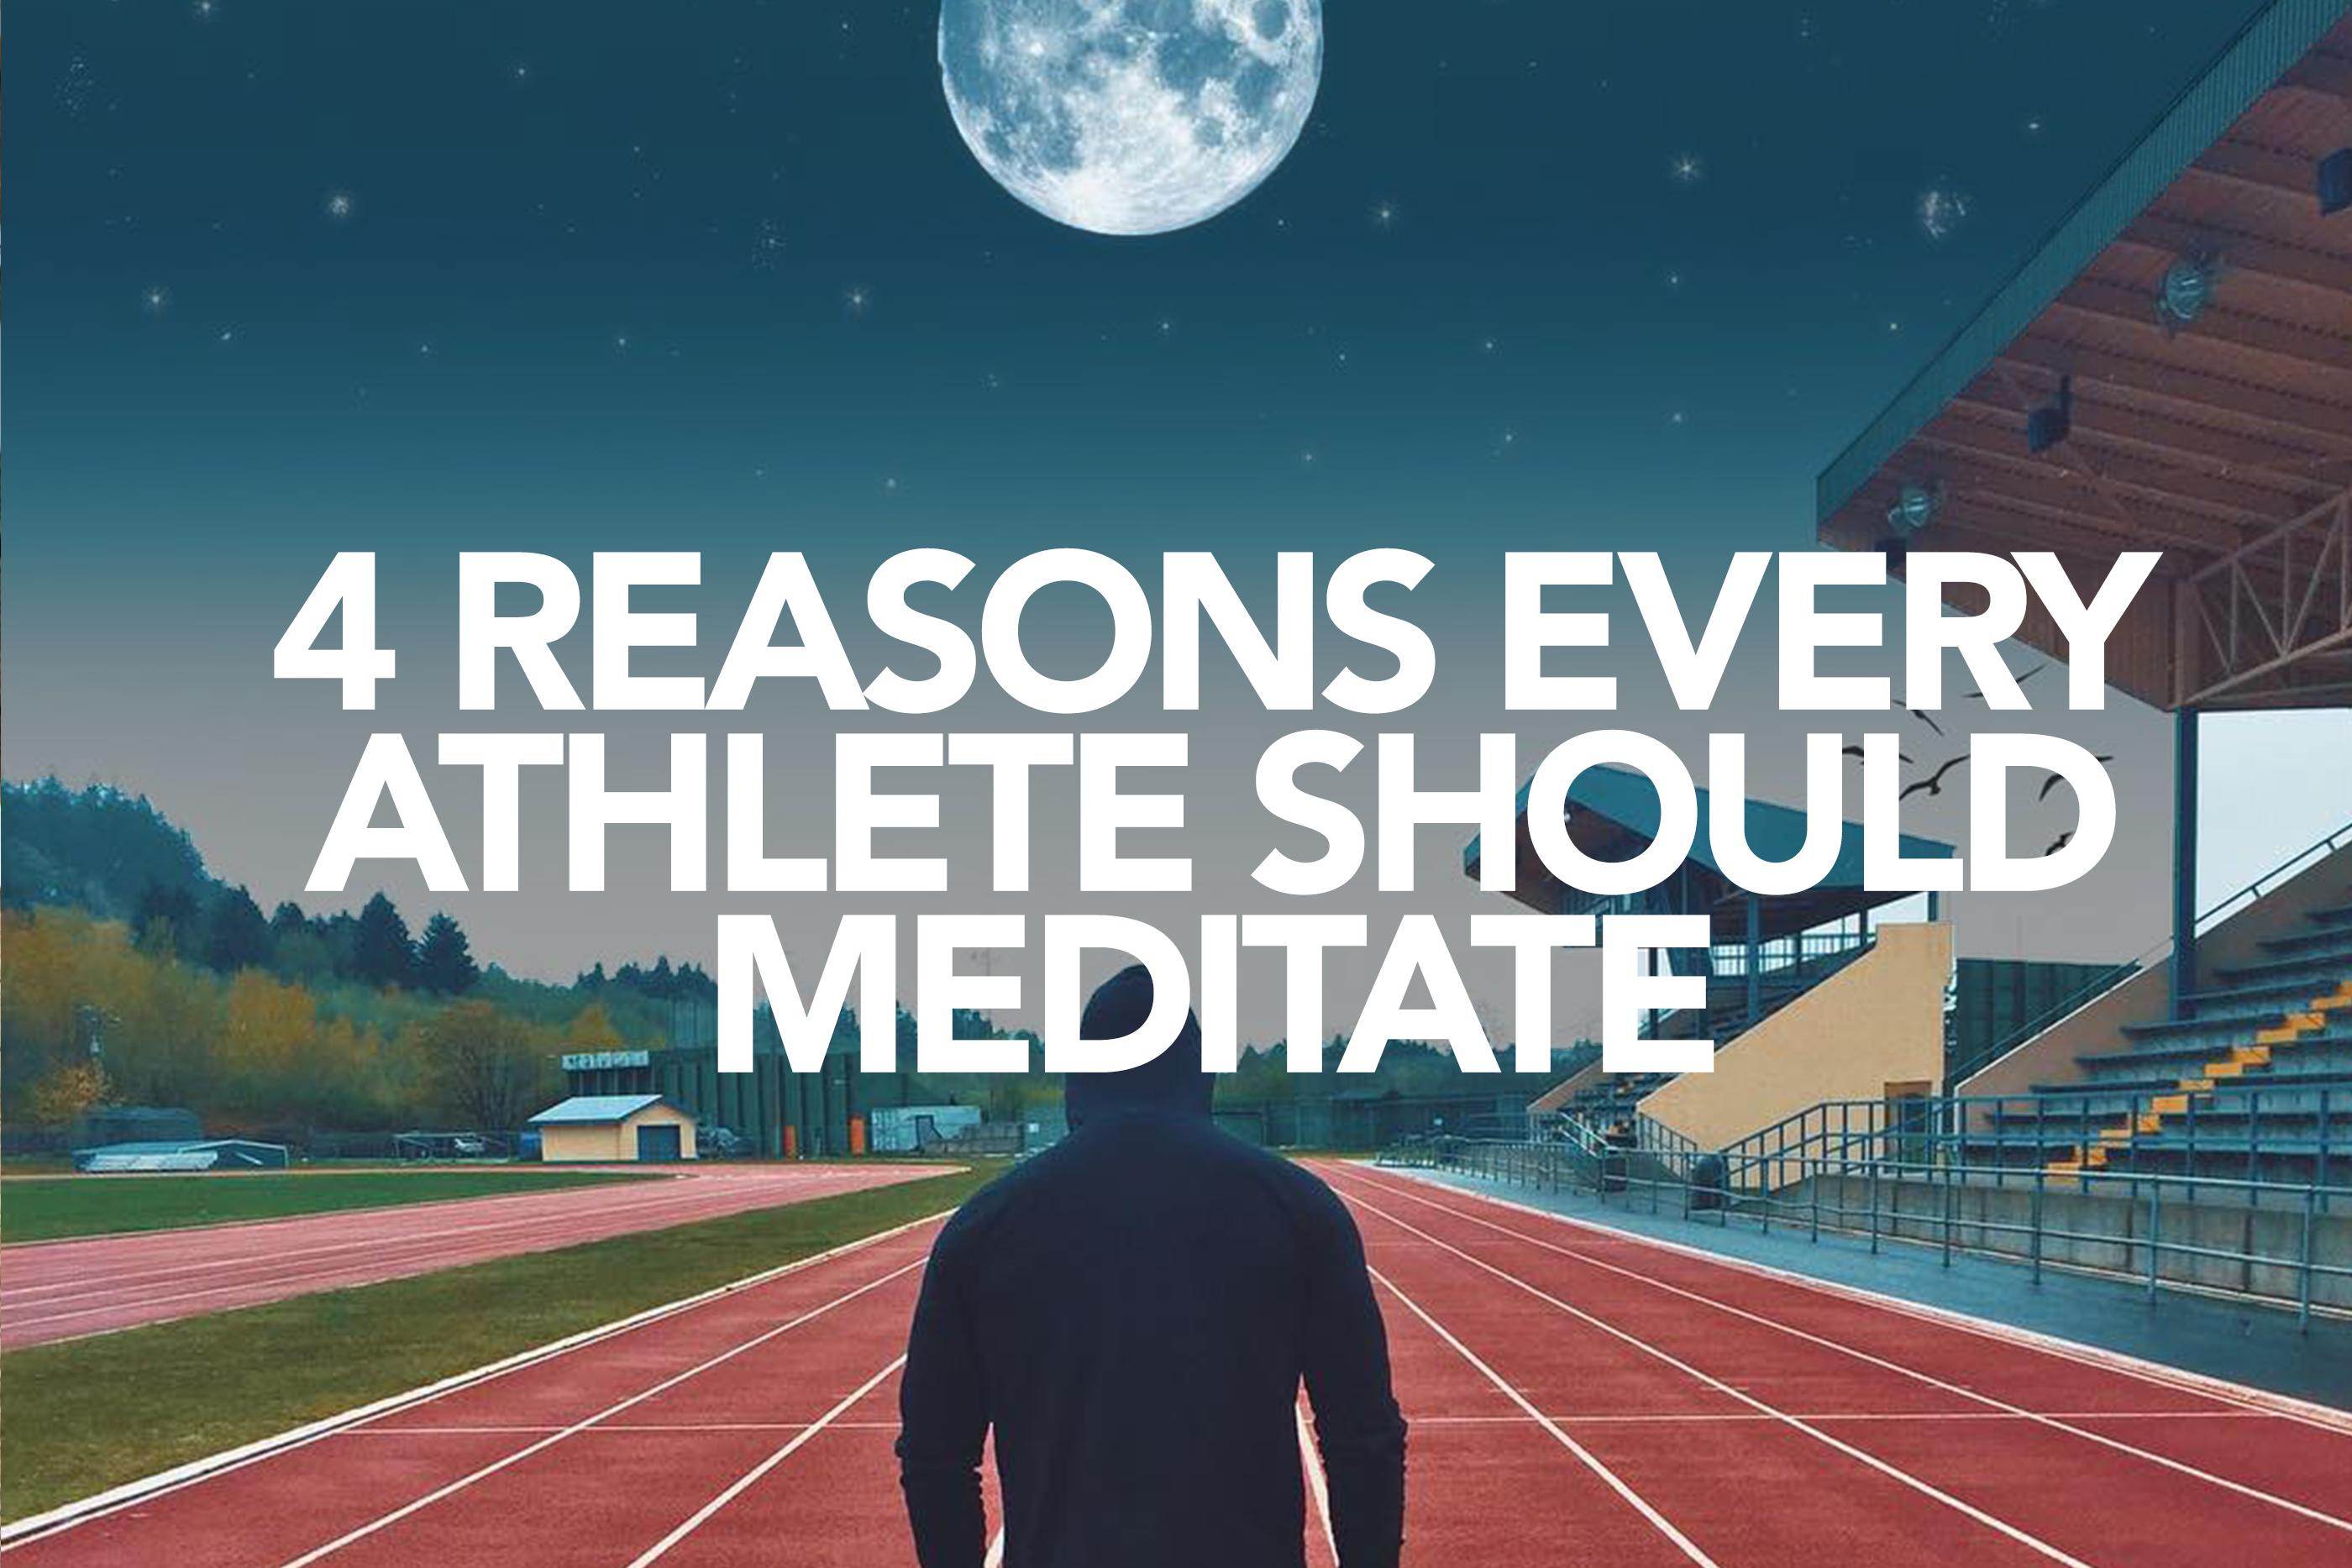 4 Reasons Athlete Should Meditate